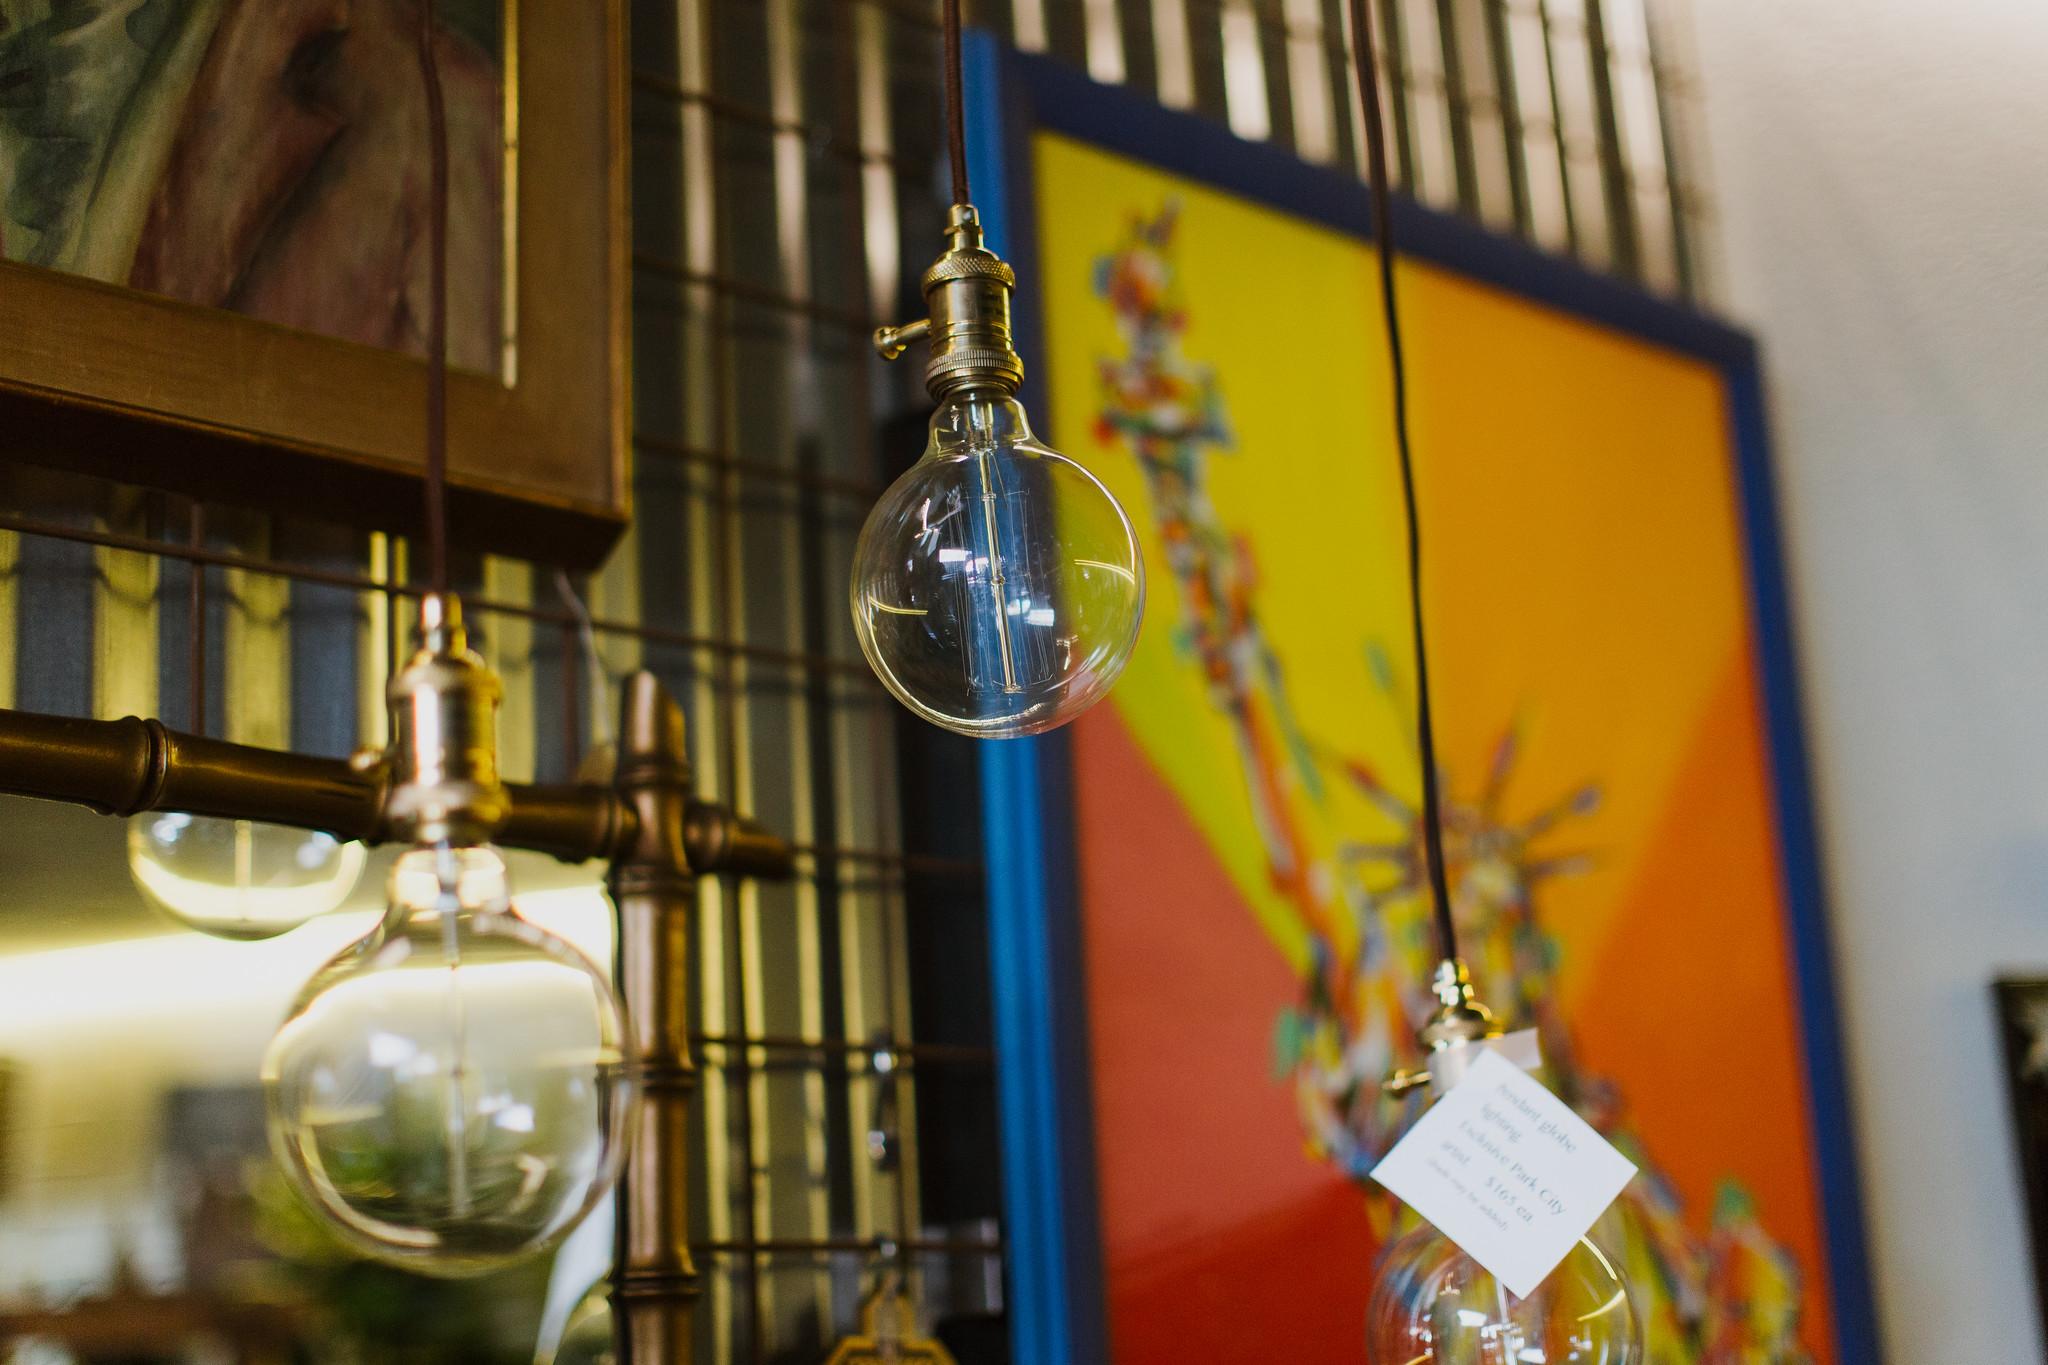 hanging light bulbs.JPG